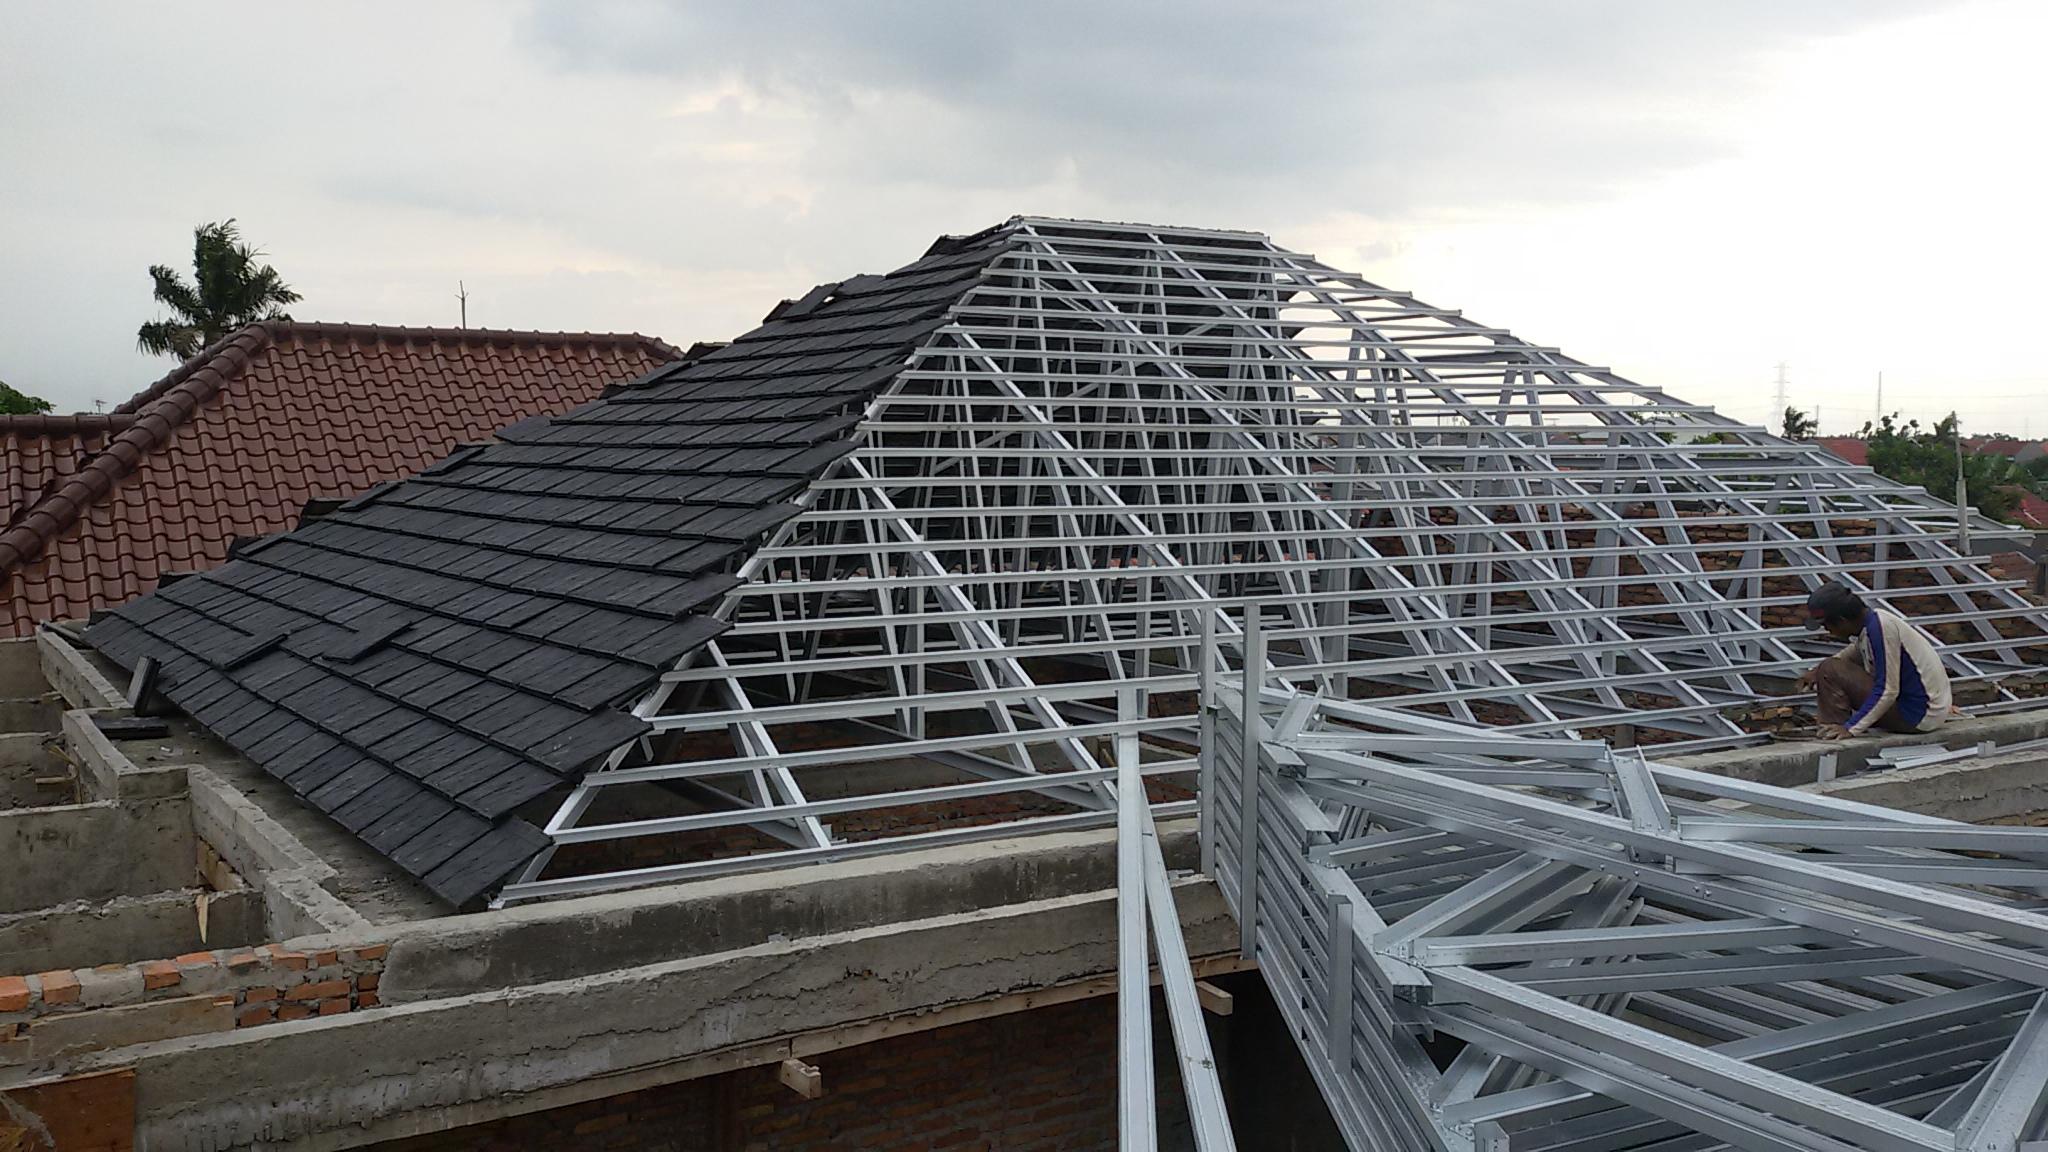 harga atap baja ringan paling murah pasang rangka kanopi